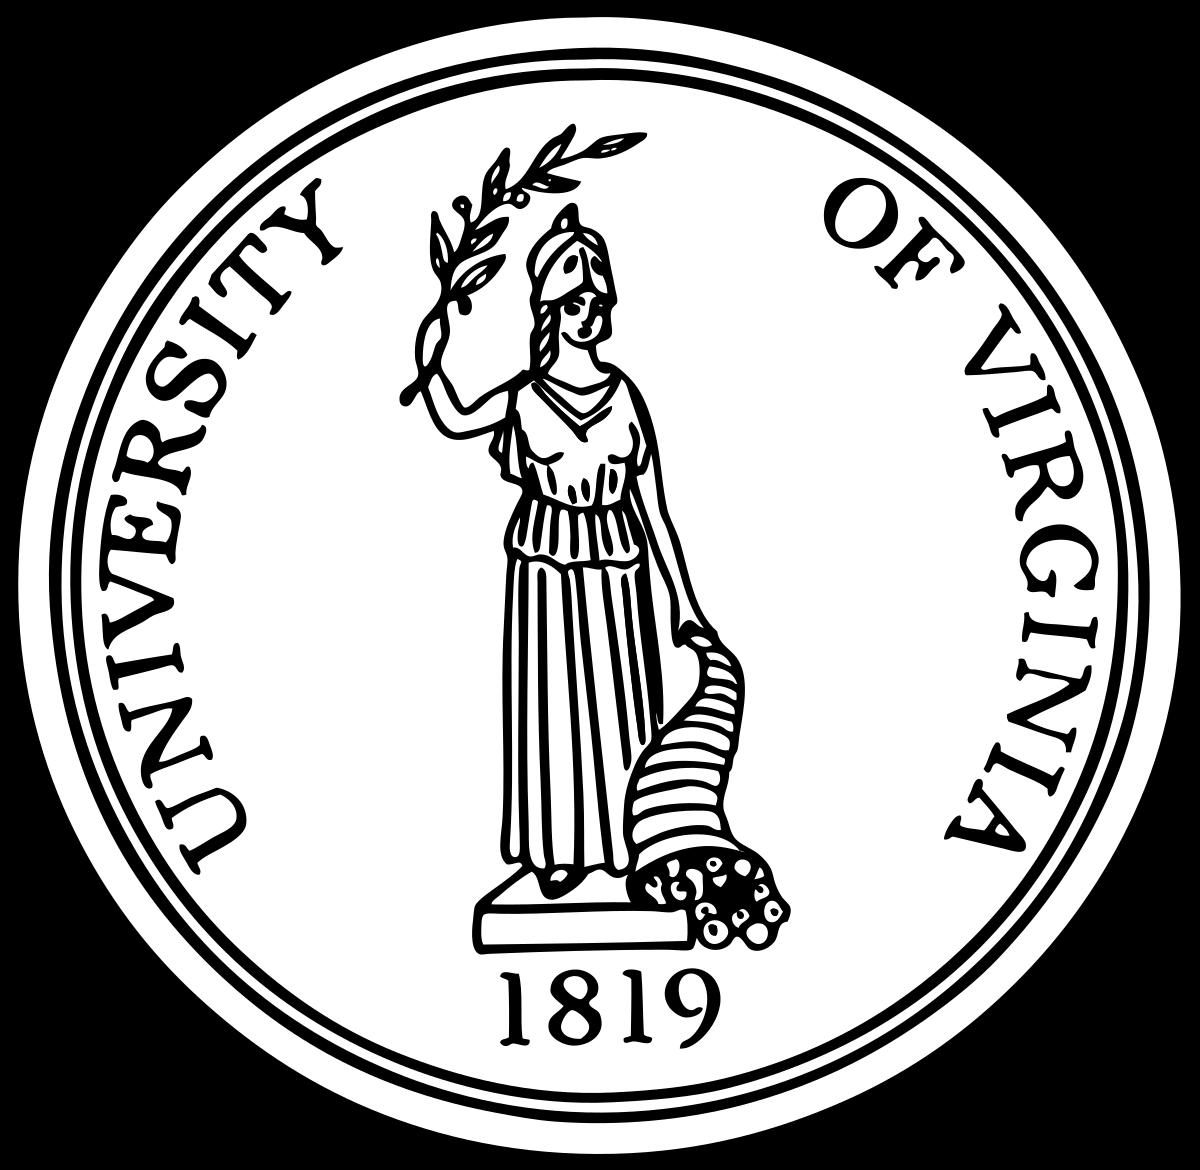 vector download Virginia vector drawing. University of wikipedia